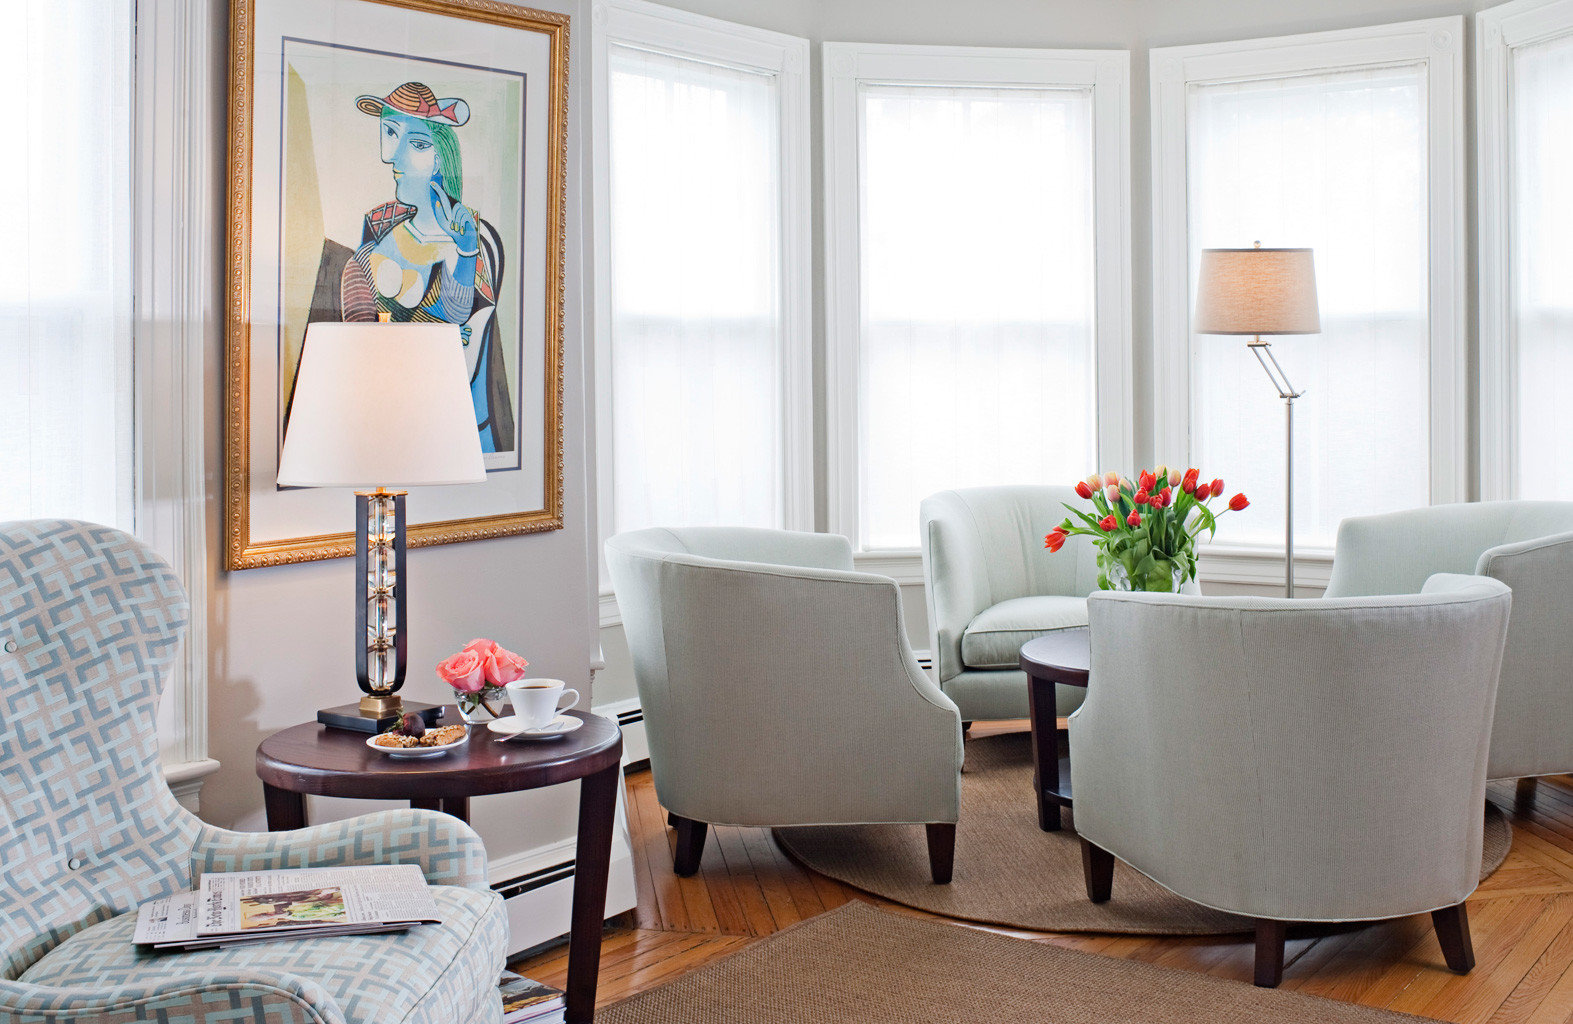 B&B Elegant Historic Inn Lounge living room property home Suite cottage arranged